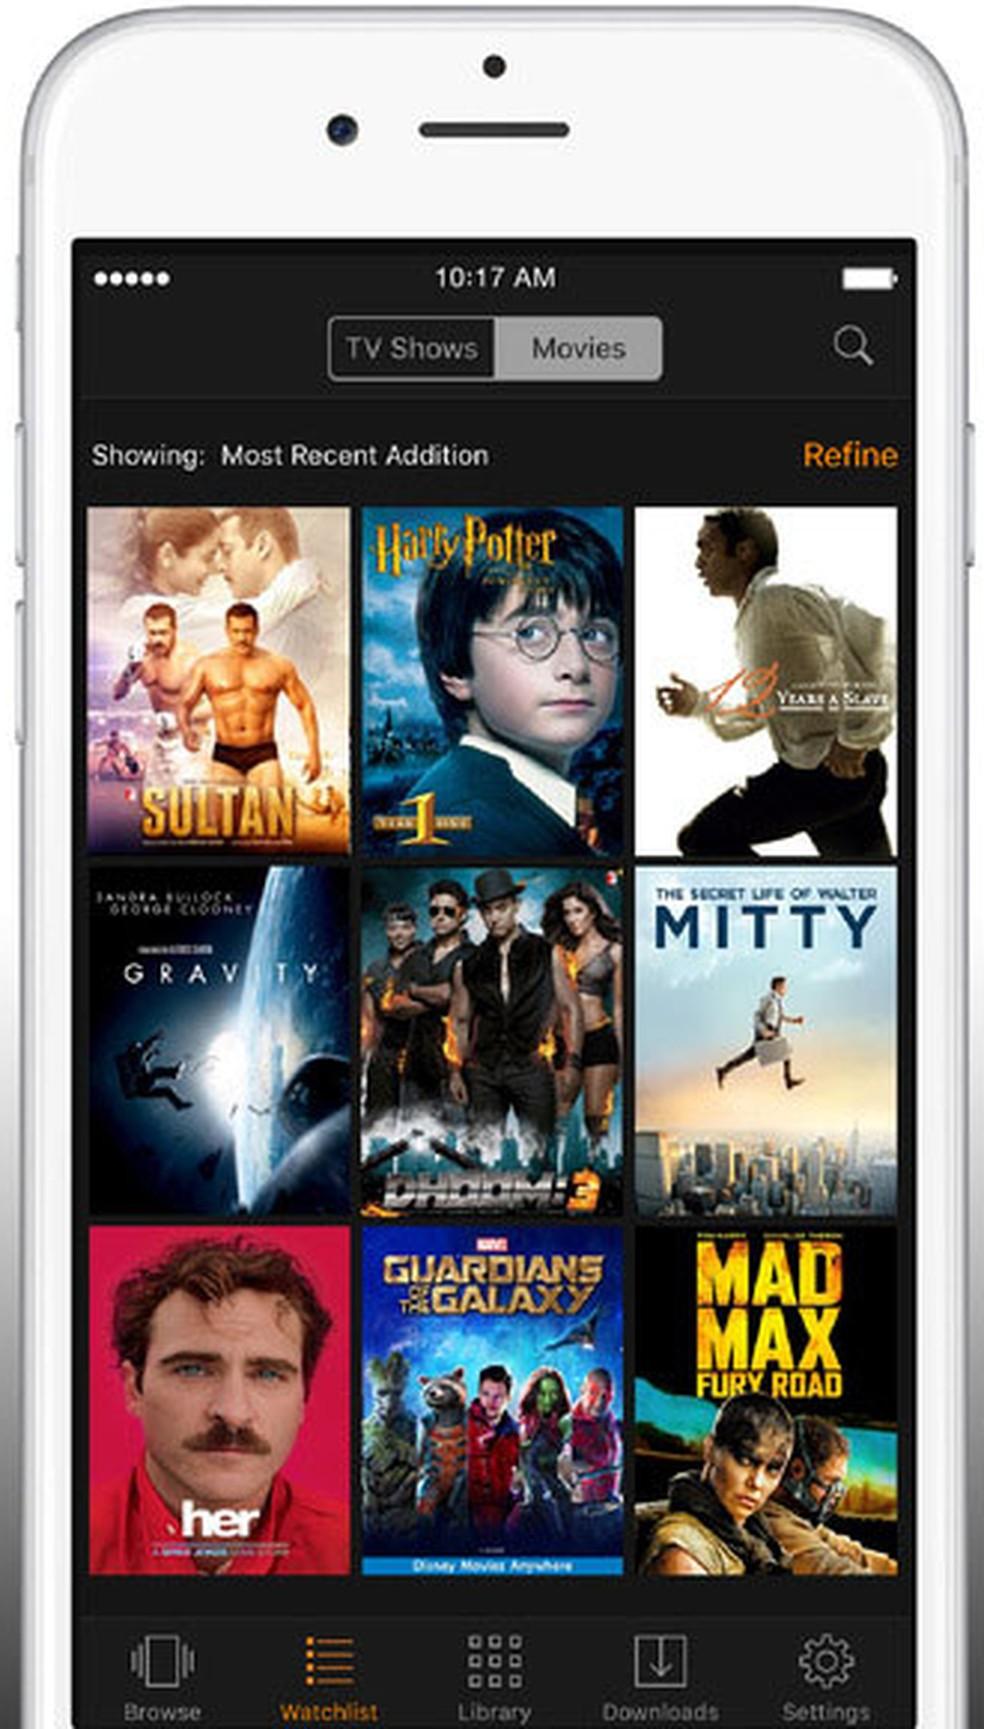 Amazon Prime Video, serviço de streaming de vídeo da Amazon (Foto: Divulgação/Amazon)